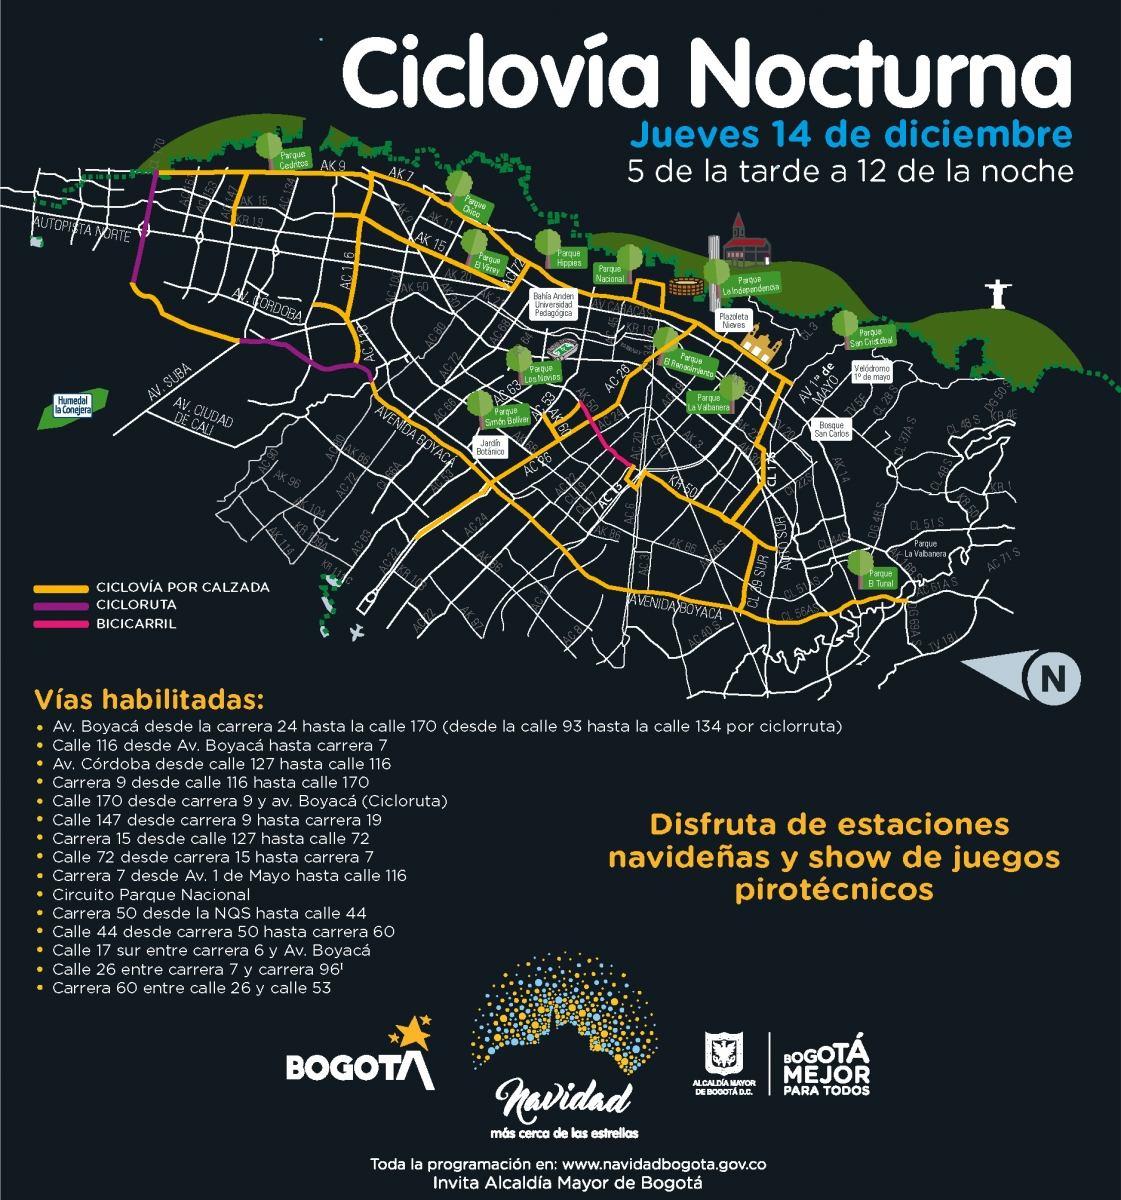 Mapa ciclovía nocturna 2017 - diciembre 14